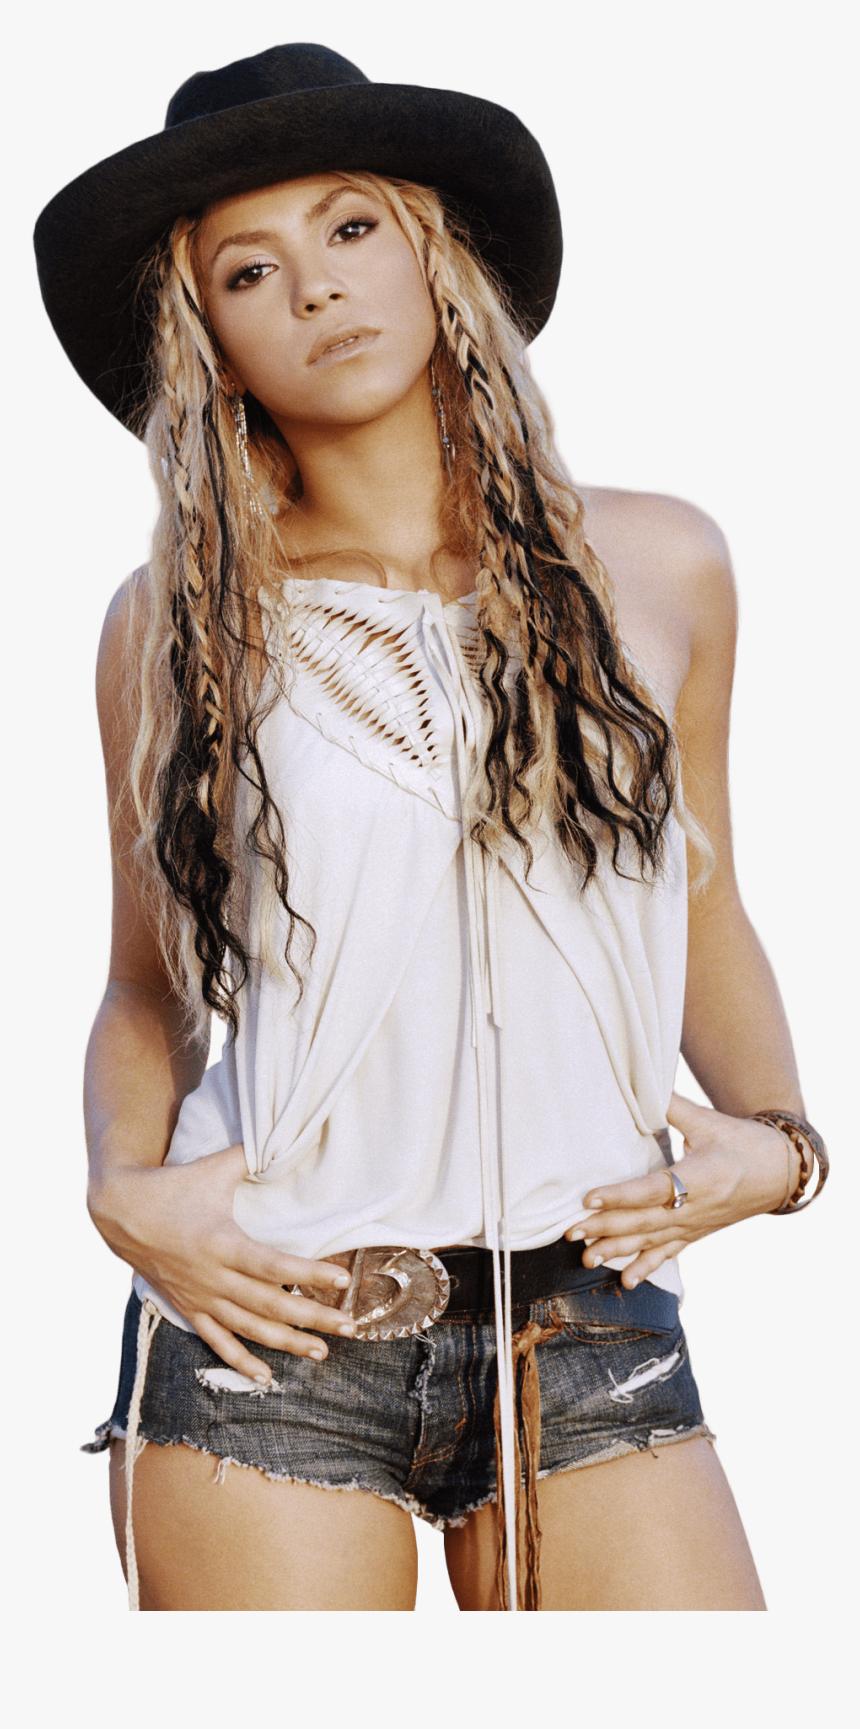 Shakira Hat - Shakira Png, Transparent Png, Free Download